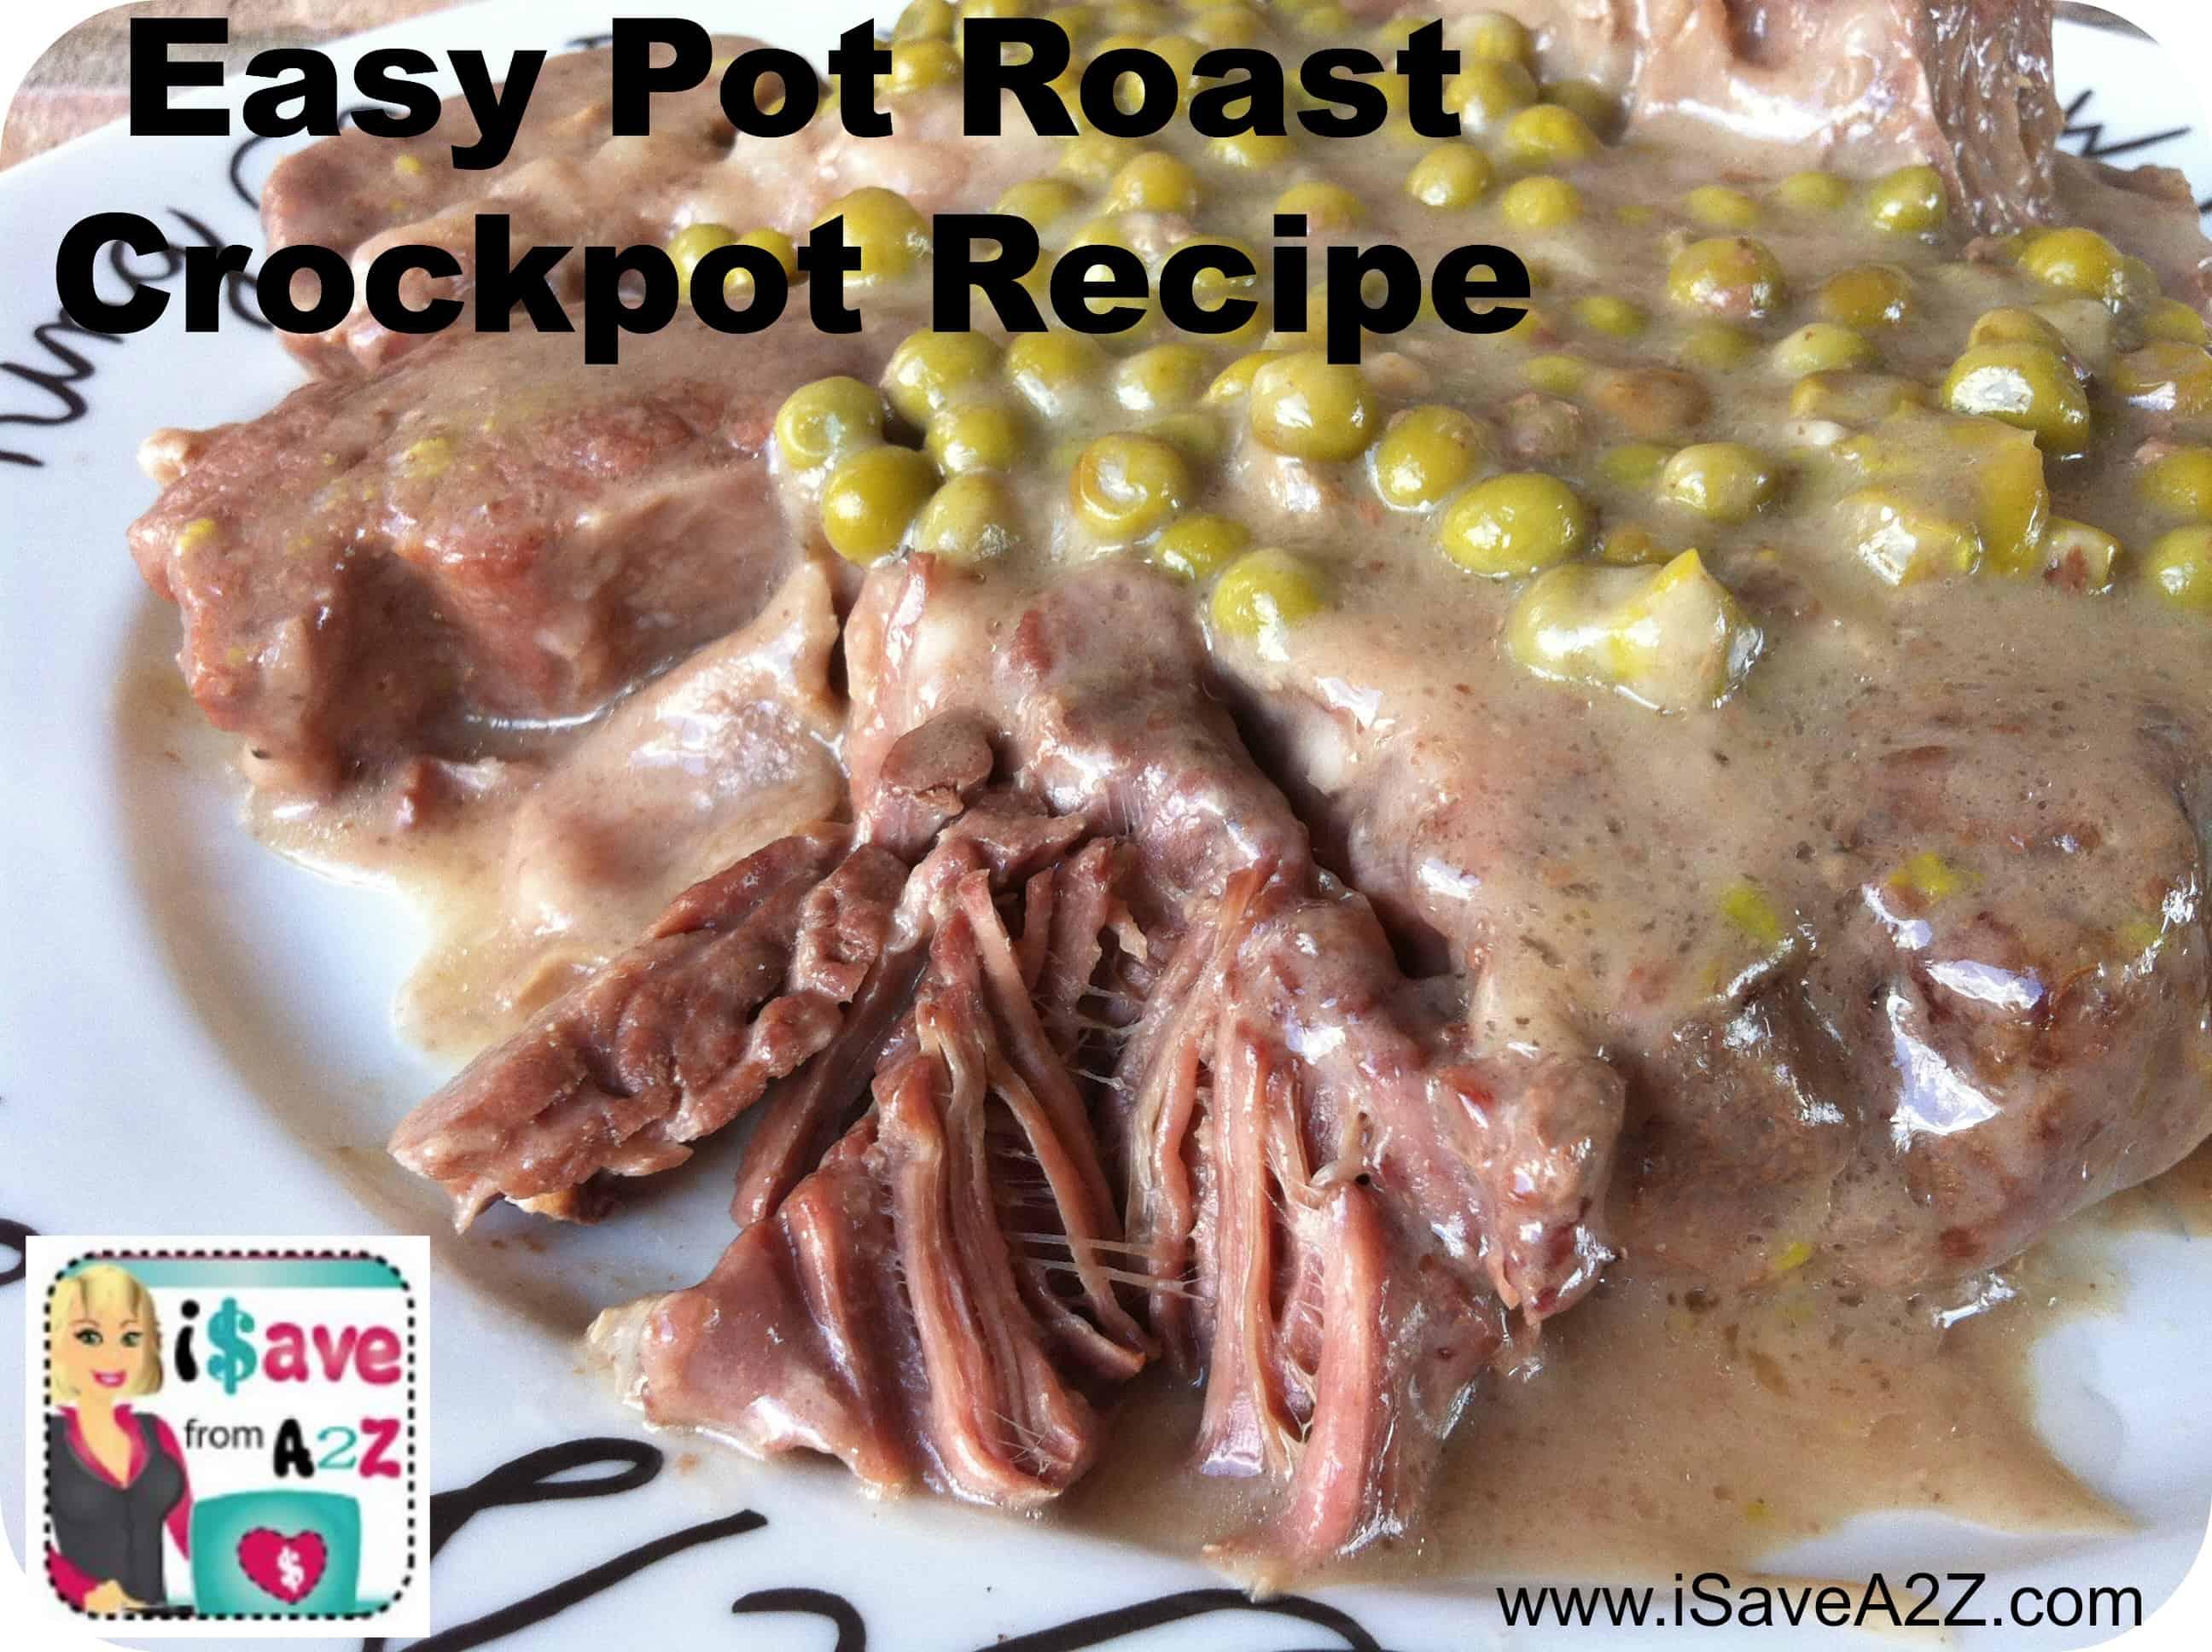 Pot Roast Crockpot Recipe - iSaveA2Z.com